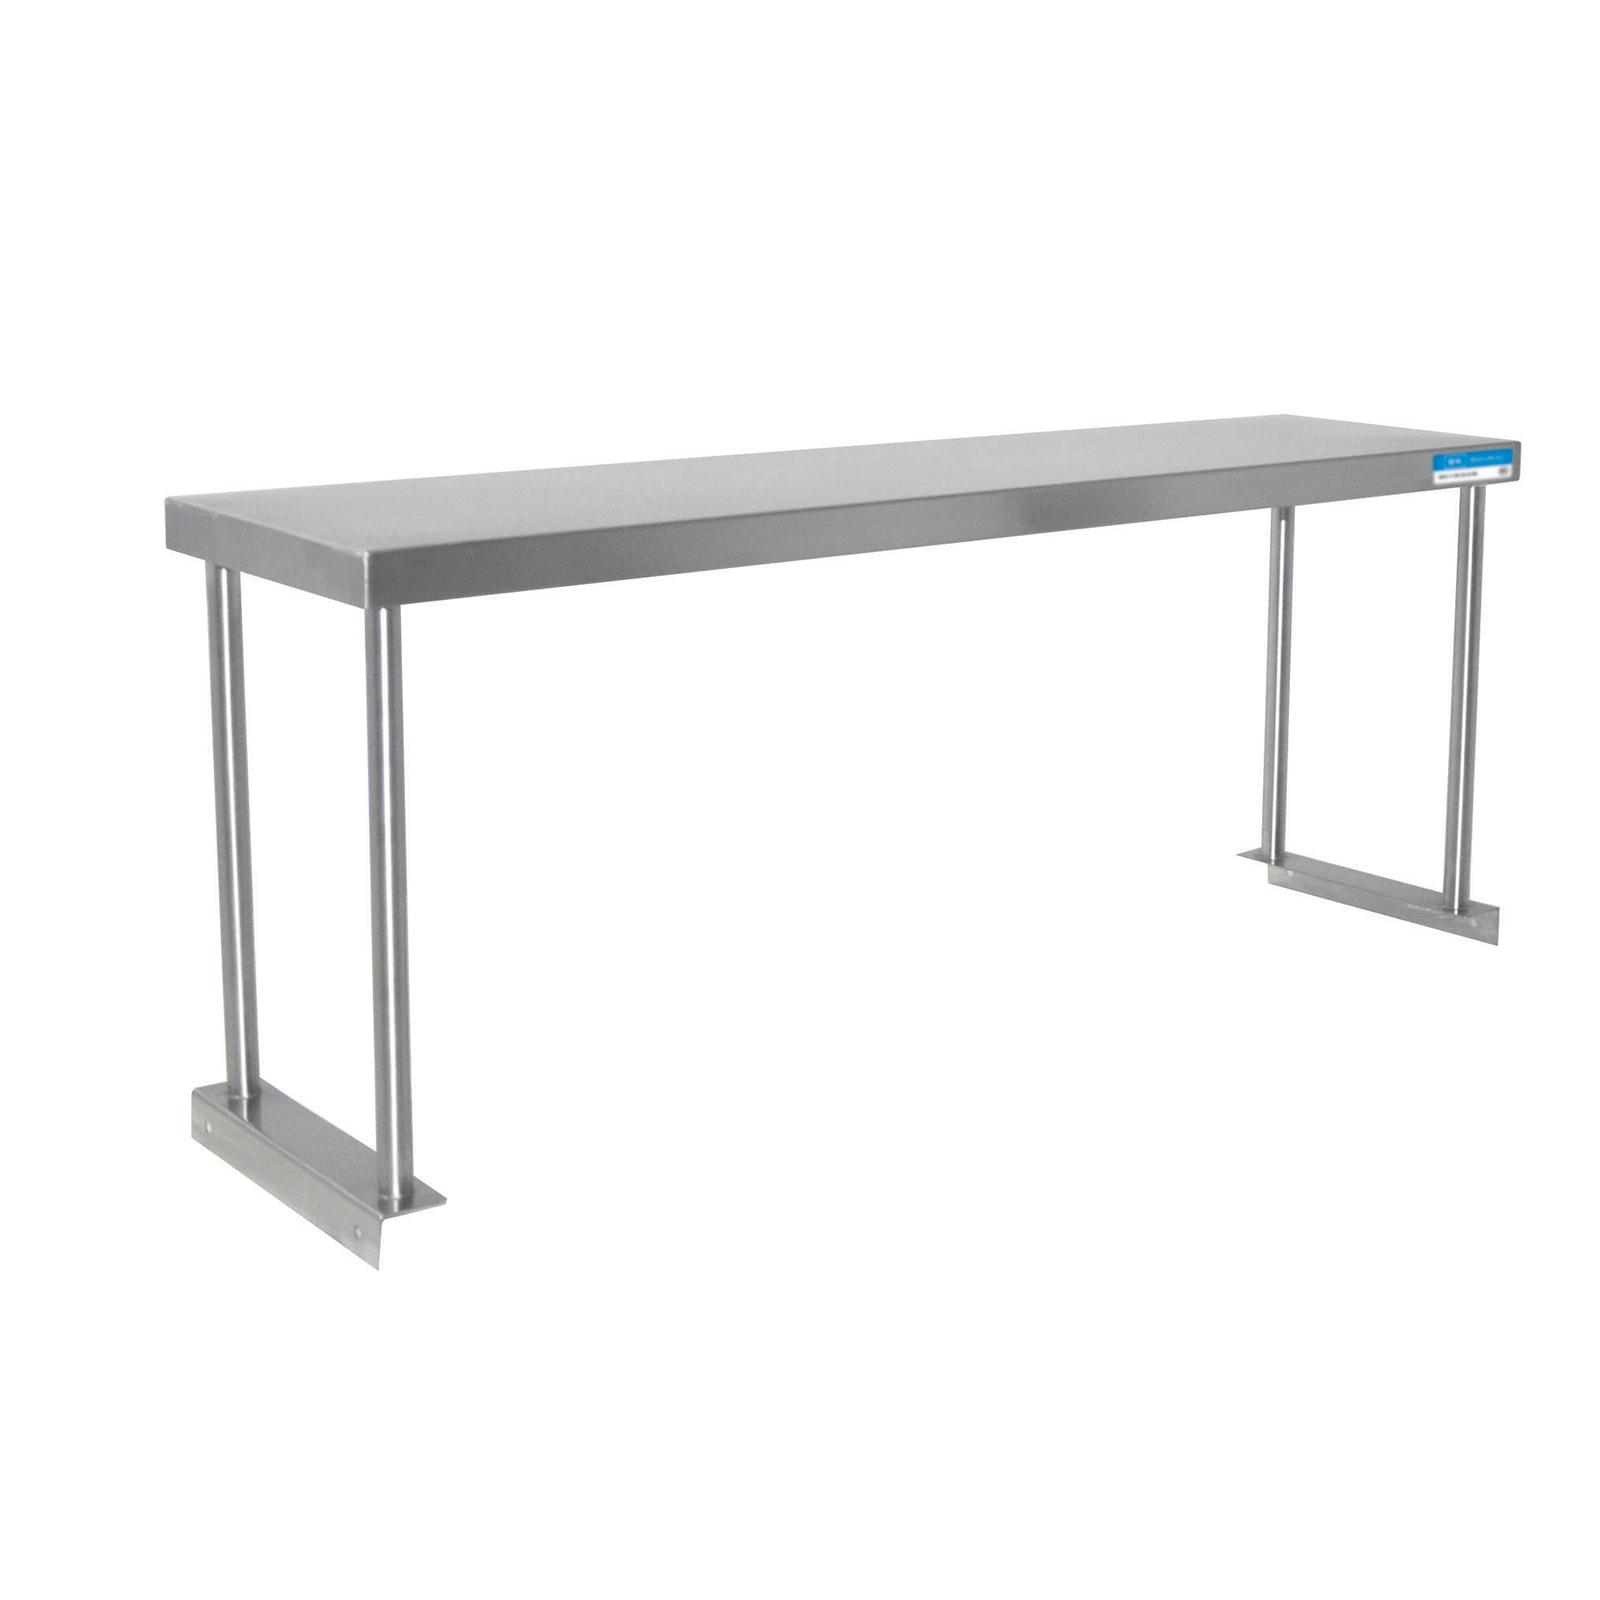 BK Resources BK-OSS-1296 overshelf, table-mounted